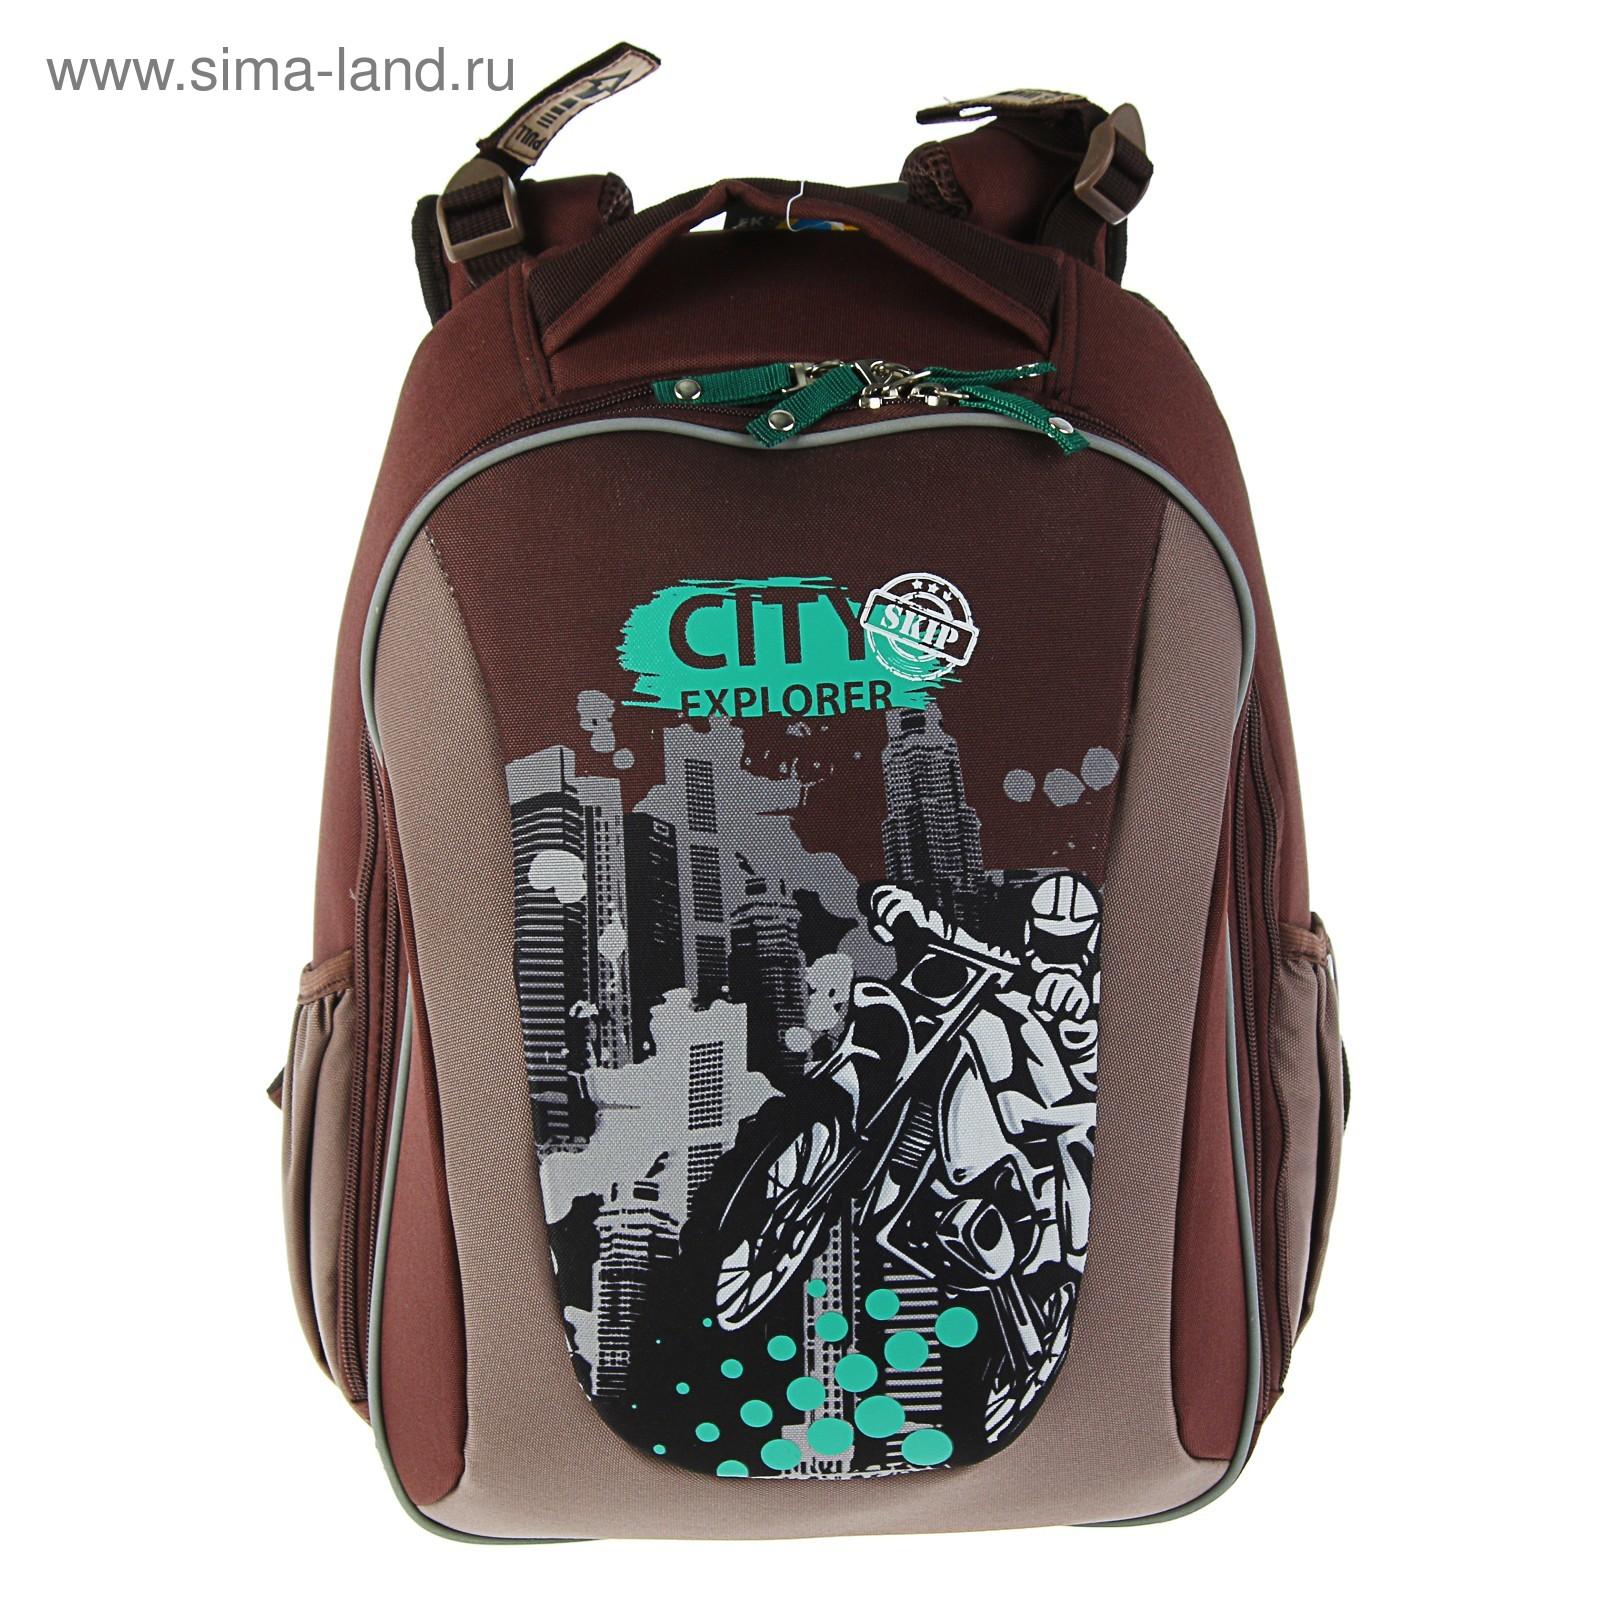 be23c14dee4a Рюкзак каркасный школьный эргономичная спинка Erich Krause 40х32х18 см  Multi Pack City Explorer